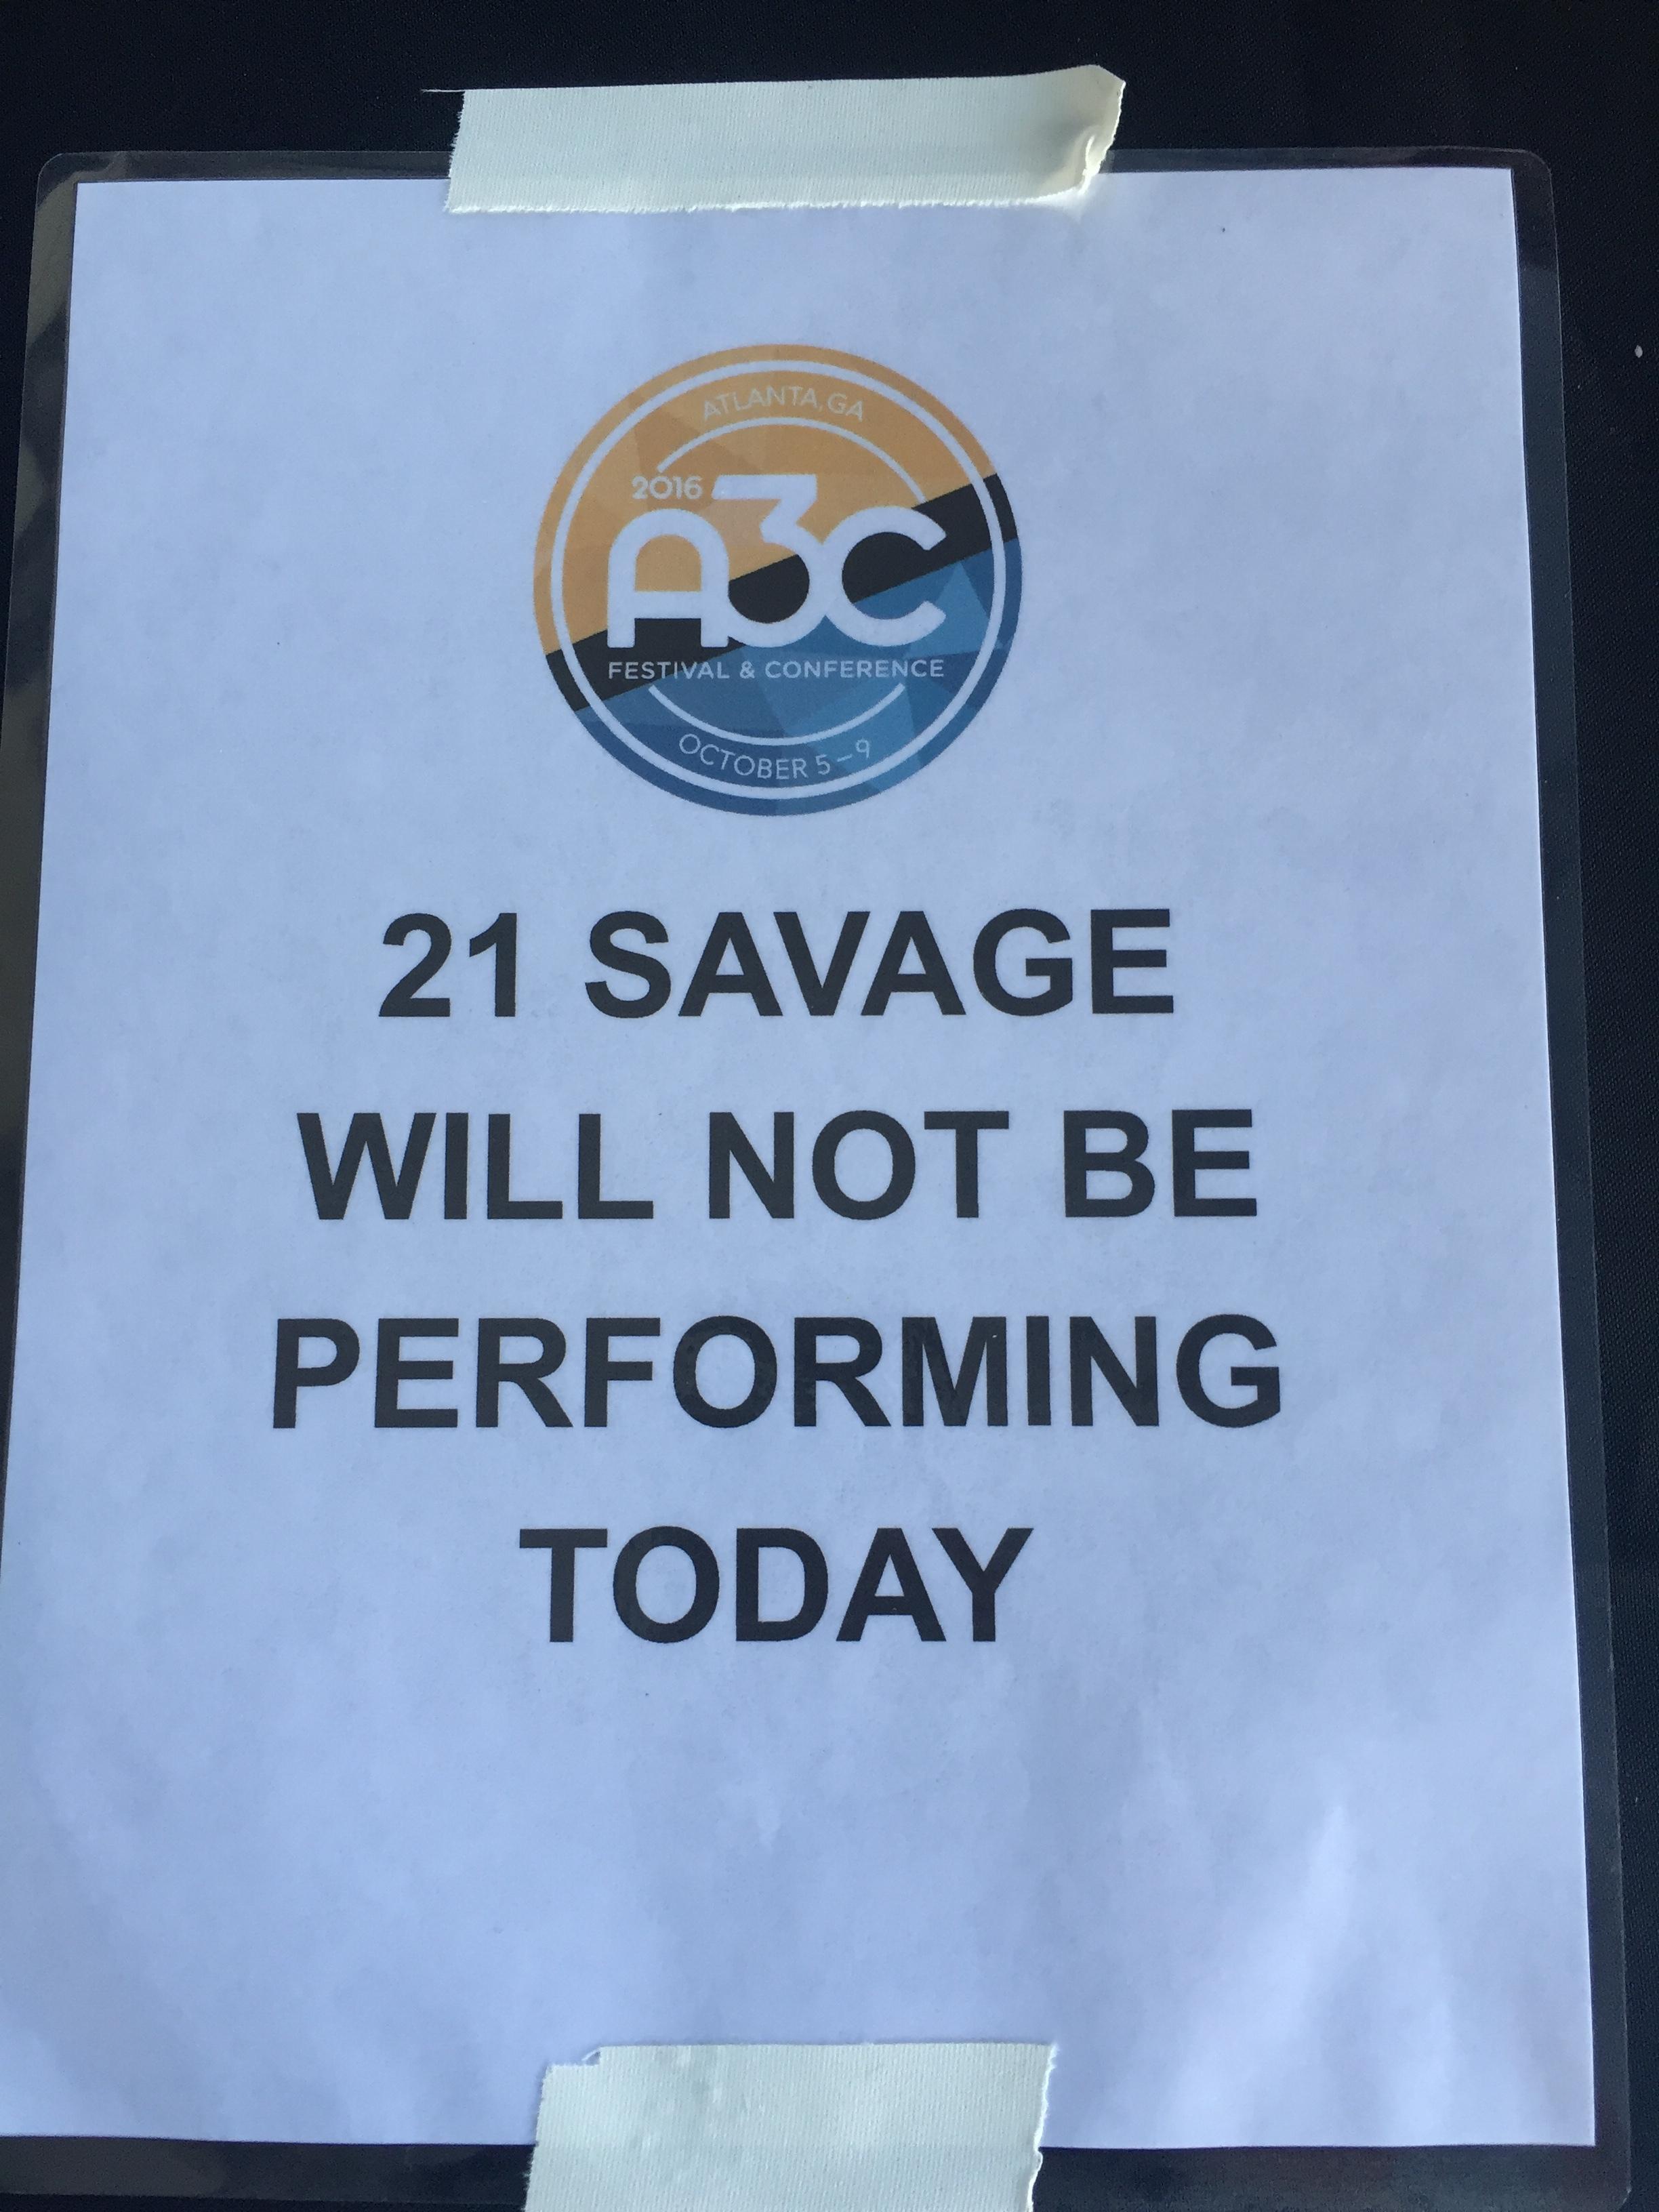 MAGIC MUSIC MANAGEMENT A3C 21 Savage